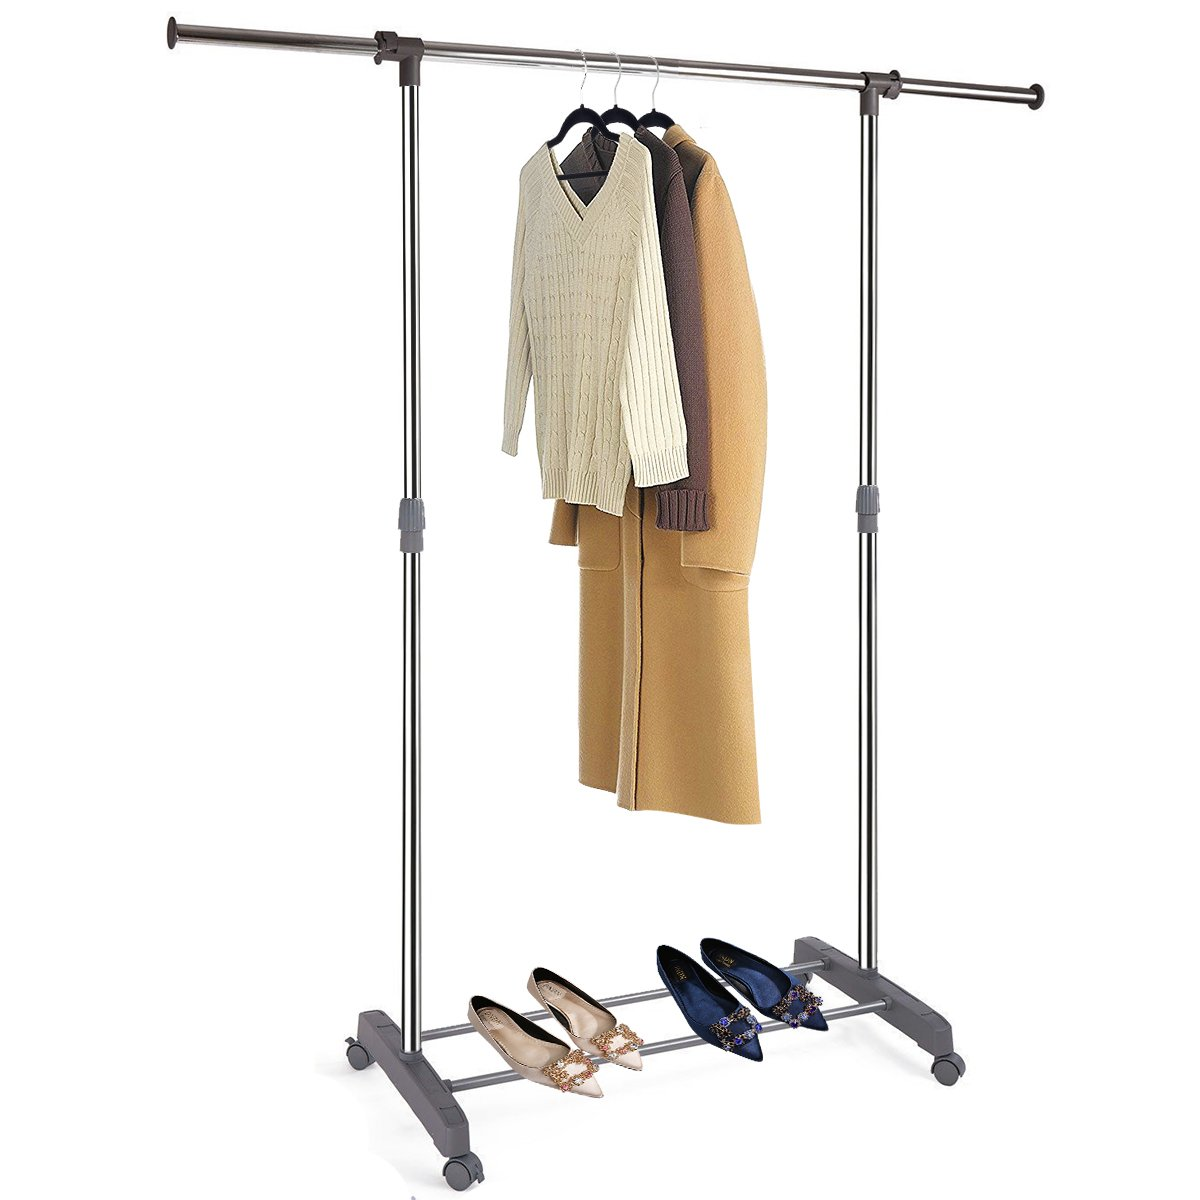 MIZGI Premium Clothes Drying Rack, 2 Tier Clothes Rack, Portable Clothes Racks for Drying Clothes, Foldable Clothes Drying Rack, Laundry Rack Drying, Rolling Clothes Rack, Outdoor Indoor (Double Rod)